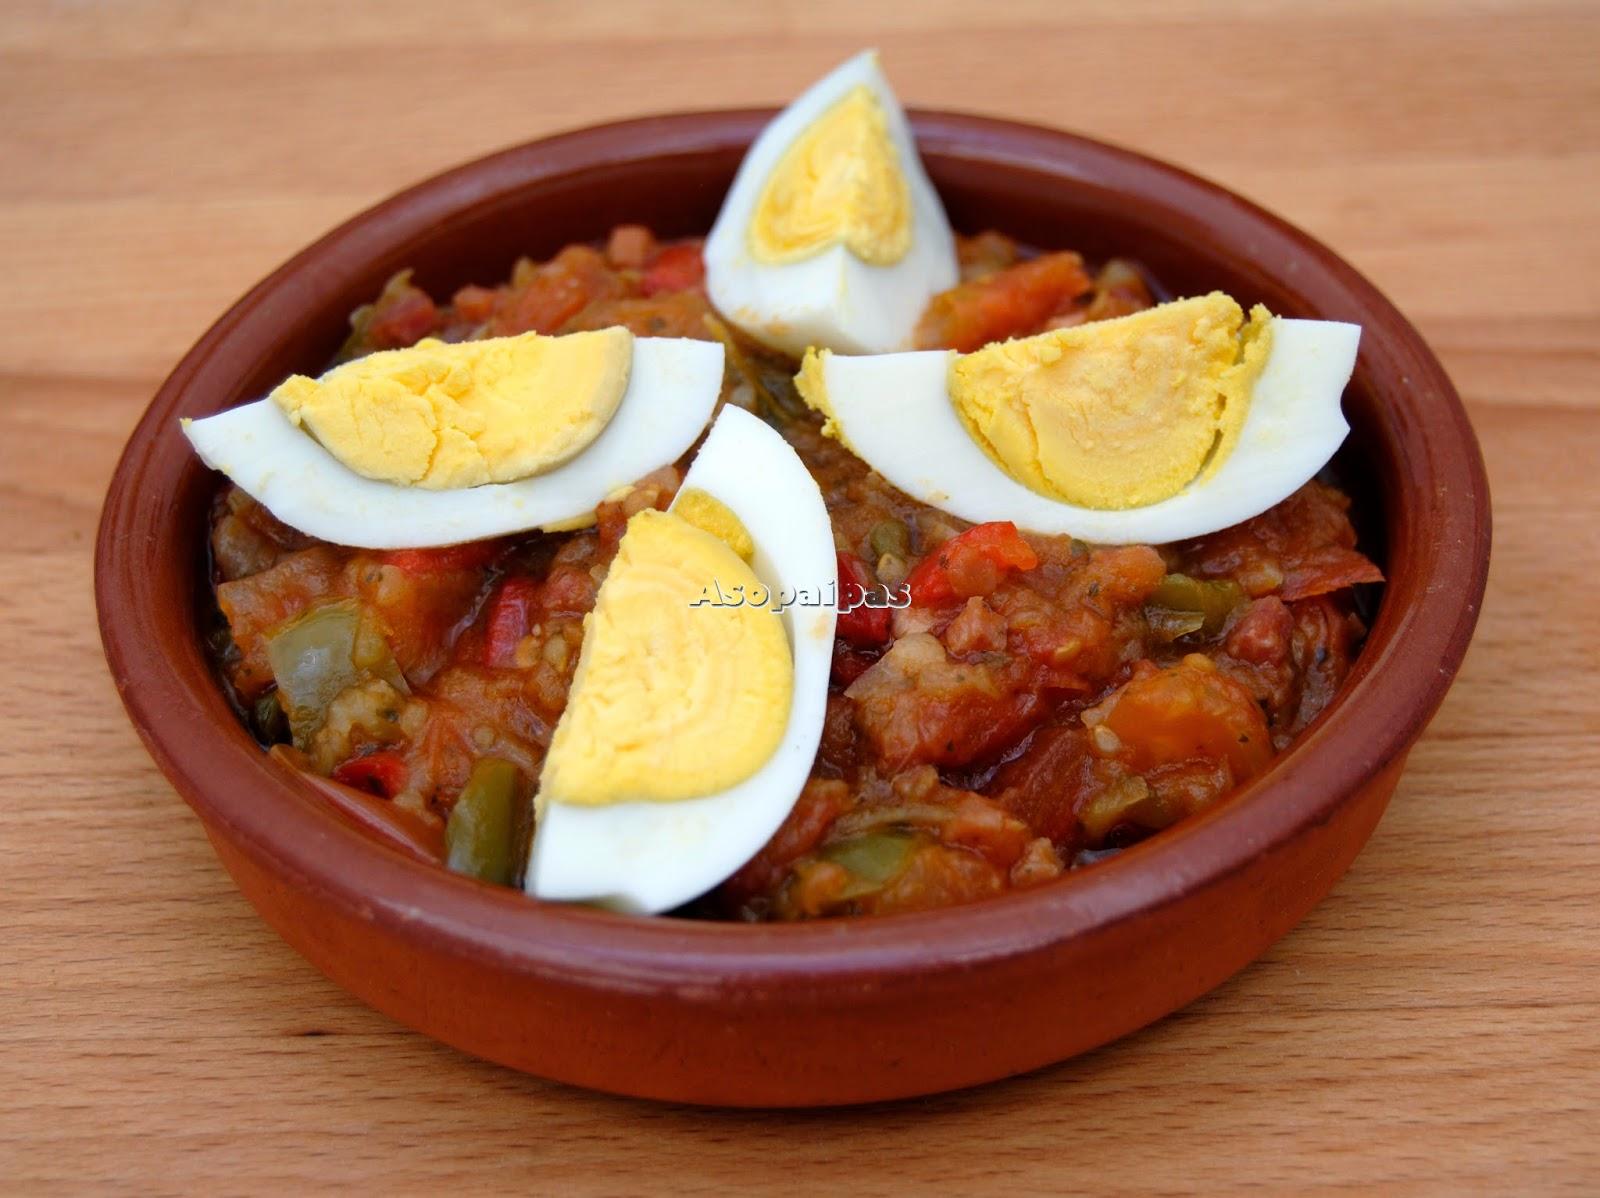 Pisto a la Asturiana